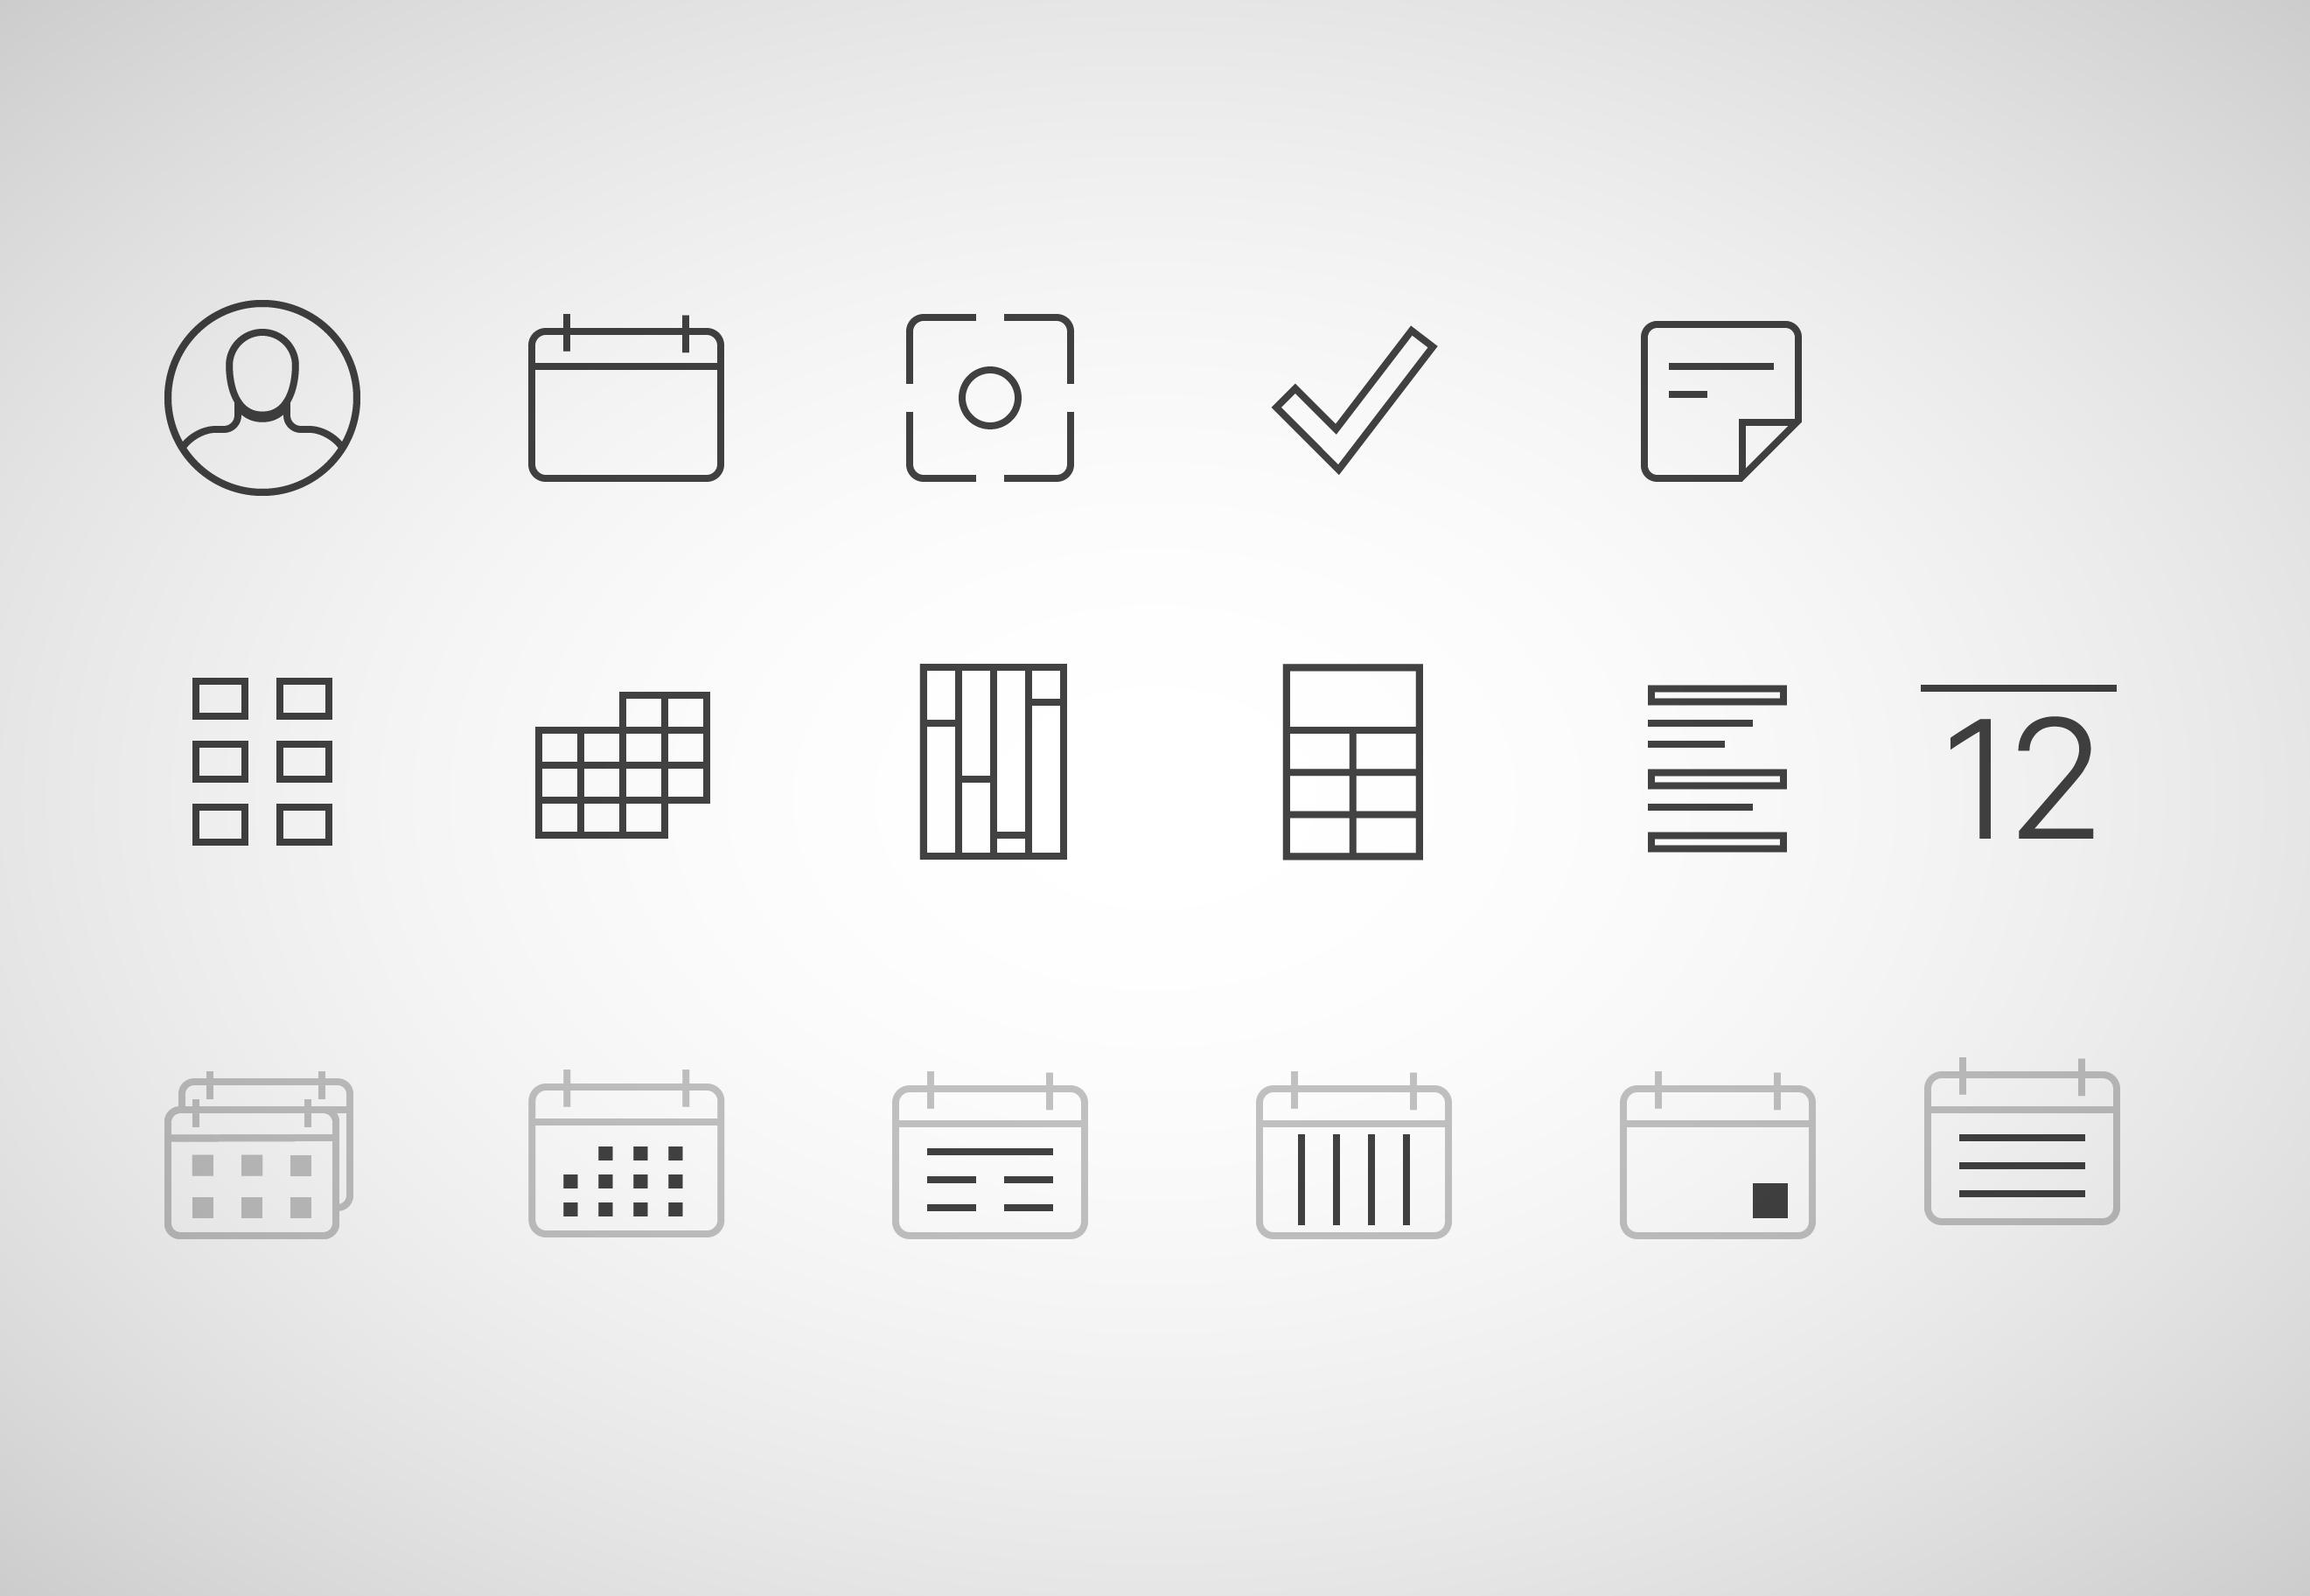 Iphone 6 Calendar Icon Gone • Printable Blank Calendar Template_Calendar Icon Gone From Iphone